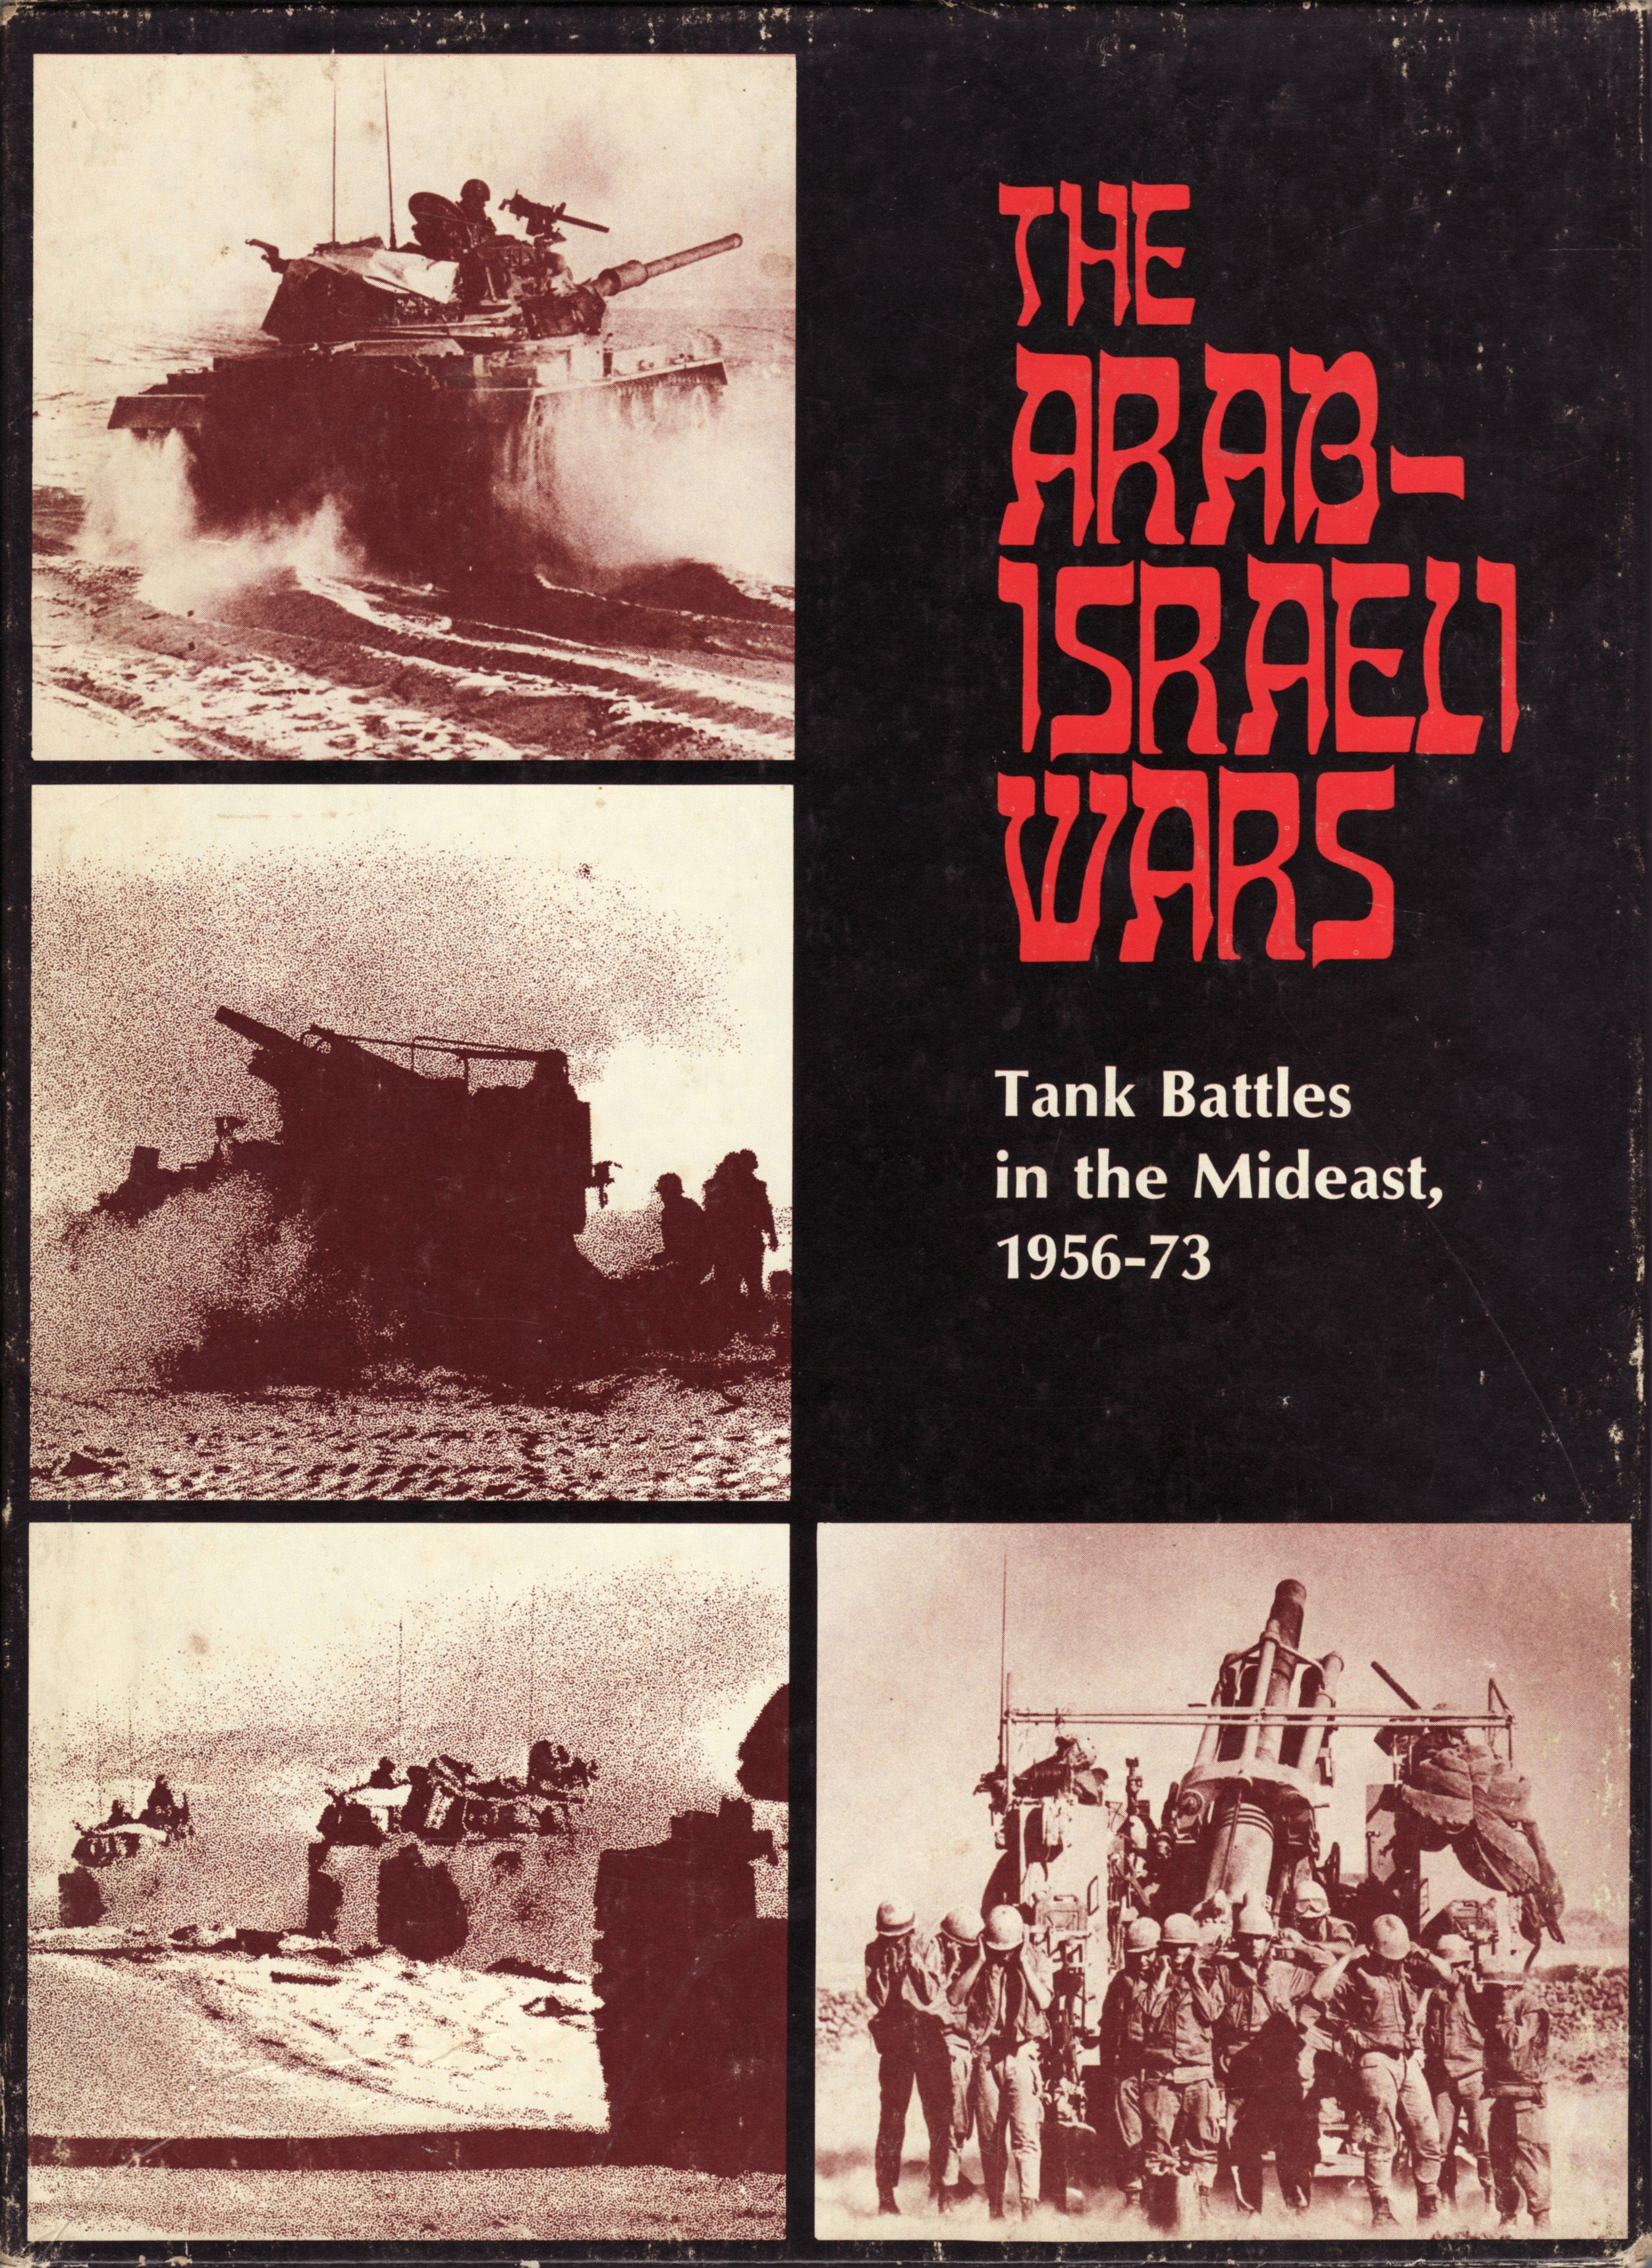 The Arab-Israeli Wars: Tank Battles in the Mideast, 1956-1973